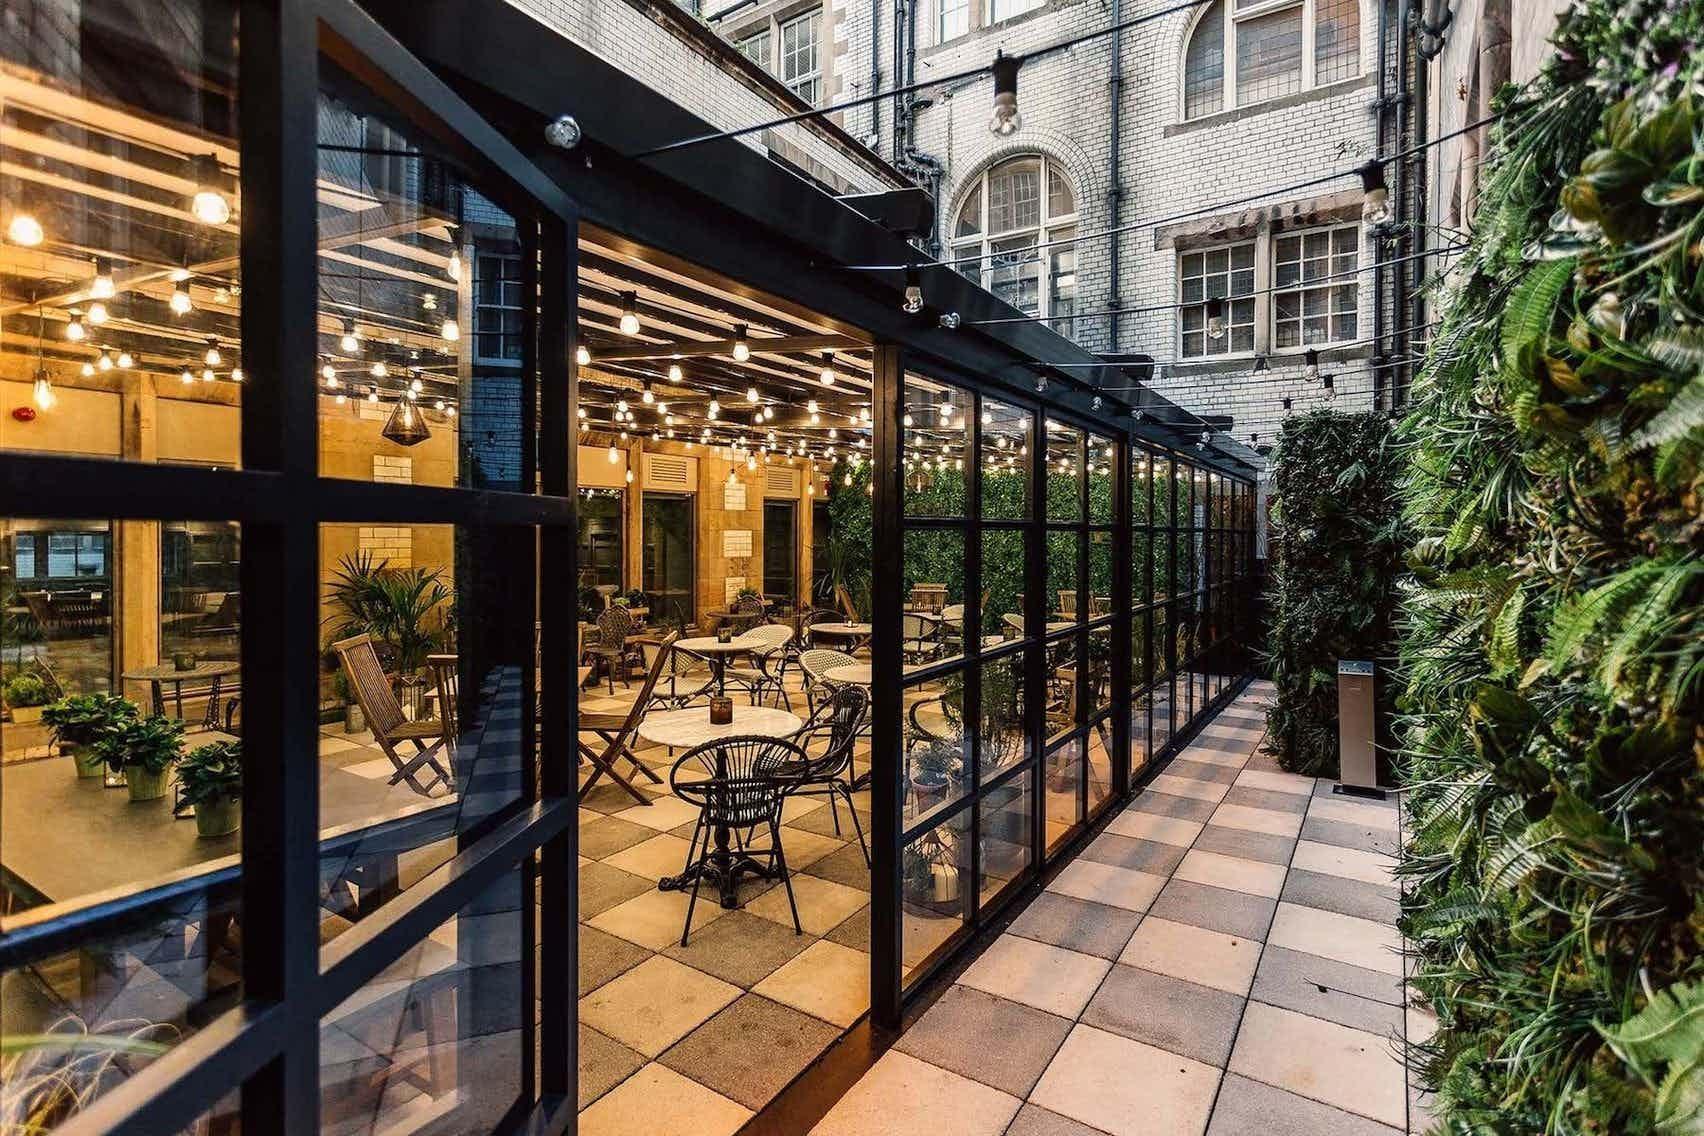 The Glenfiddich Garden Suite, The Scotsman Hotel & Grand Café